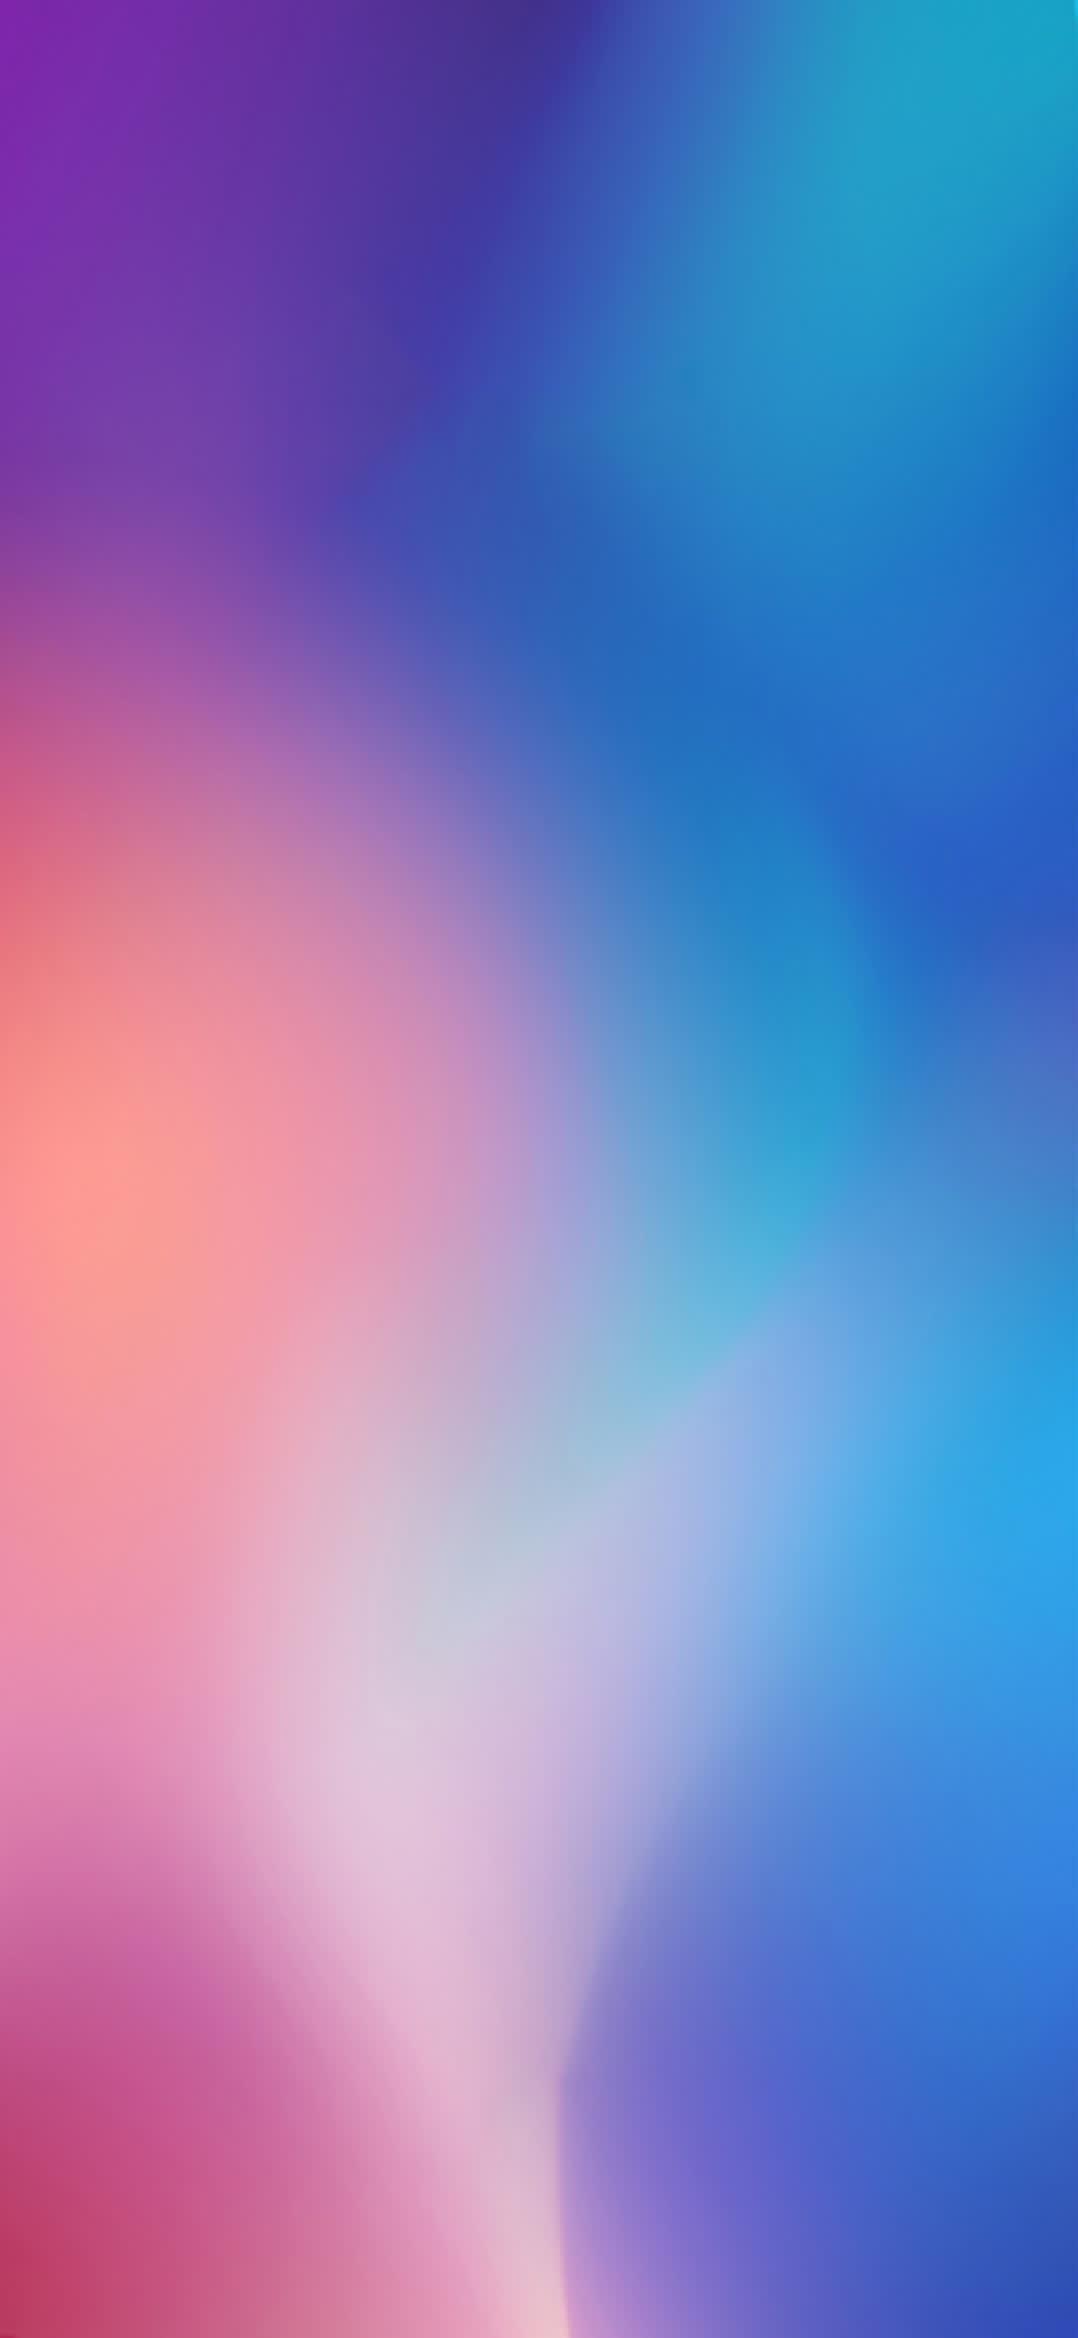 Download Xiaomi Mi 9/Mi 9 SE/Explore Stock Wallpapers in FHD+ [1080